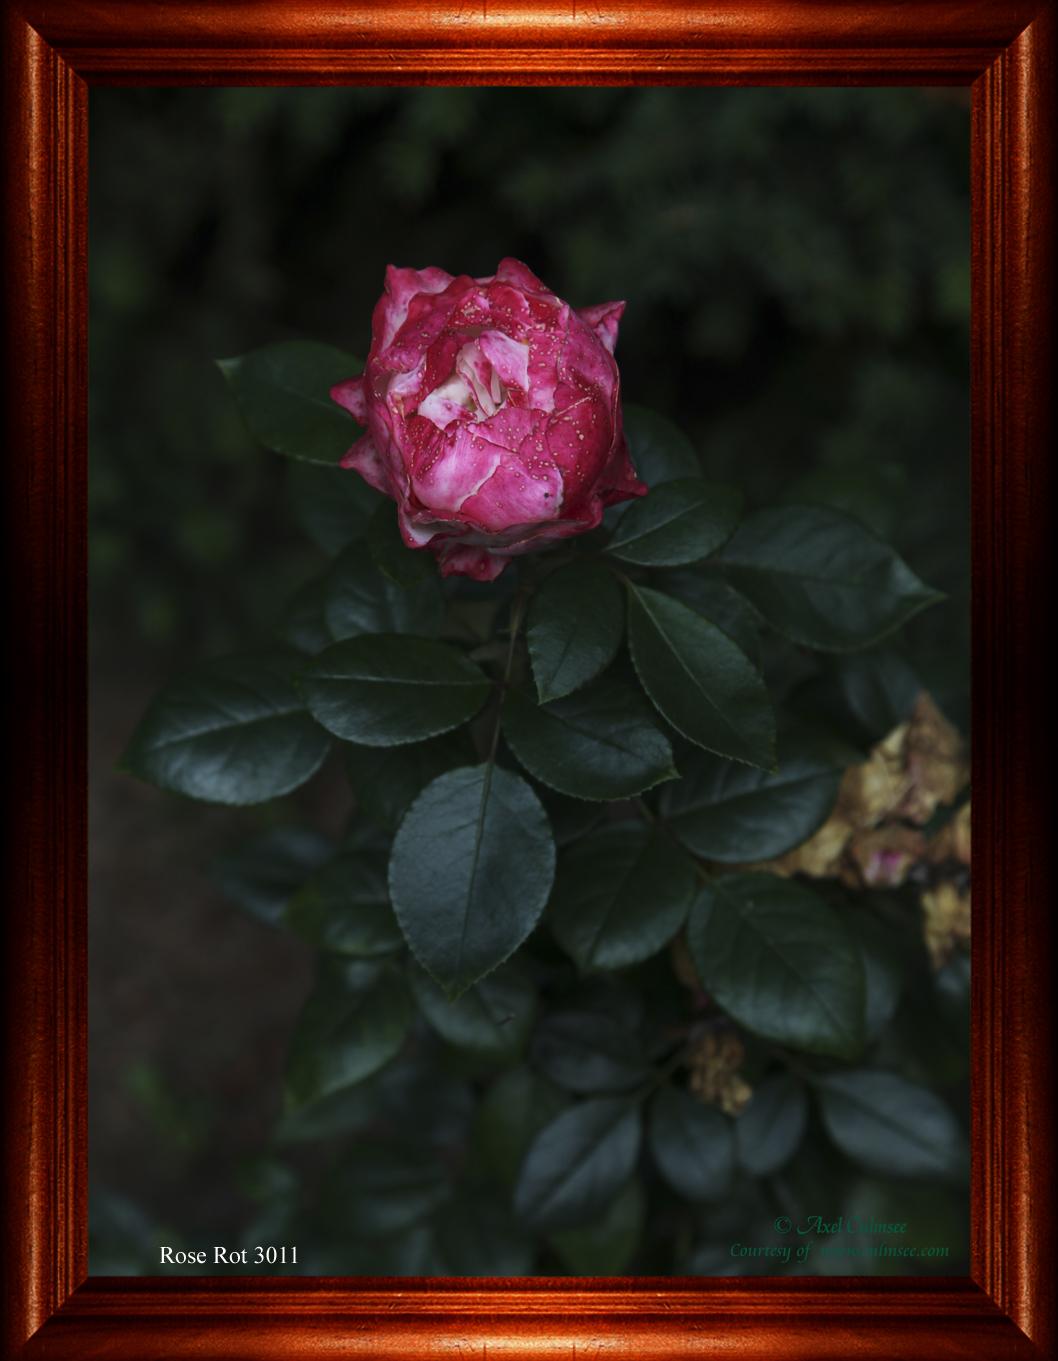 Rose Rot 3011